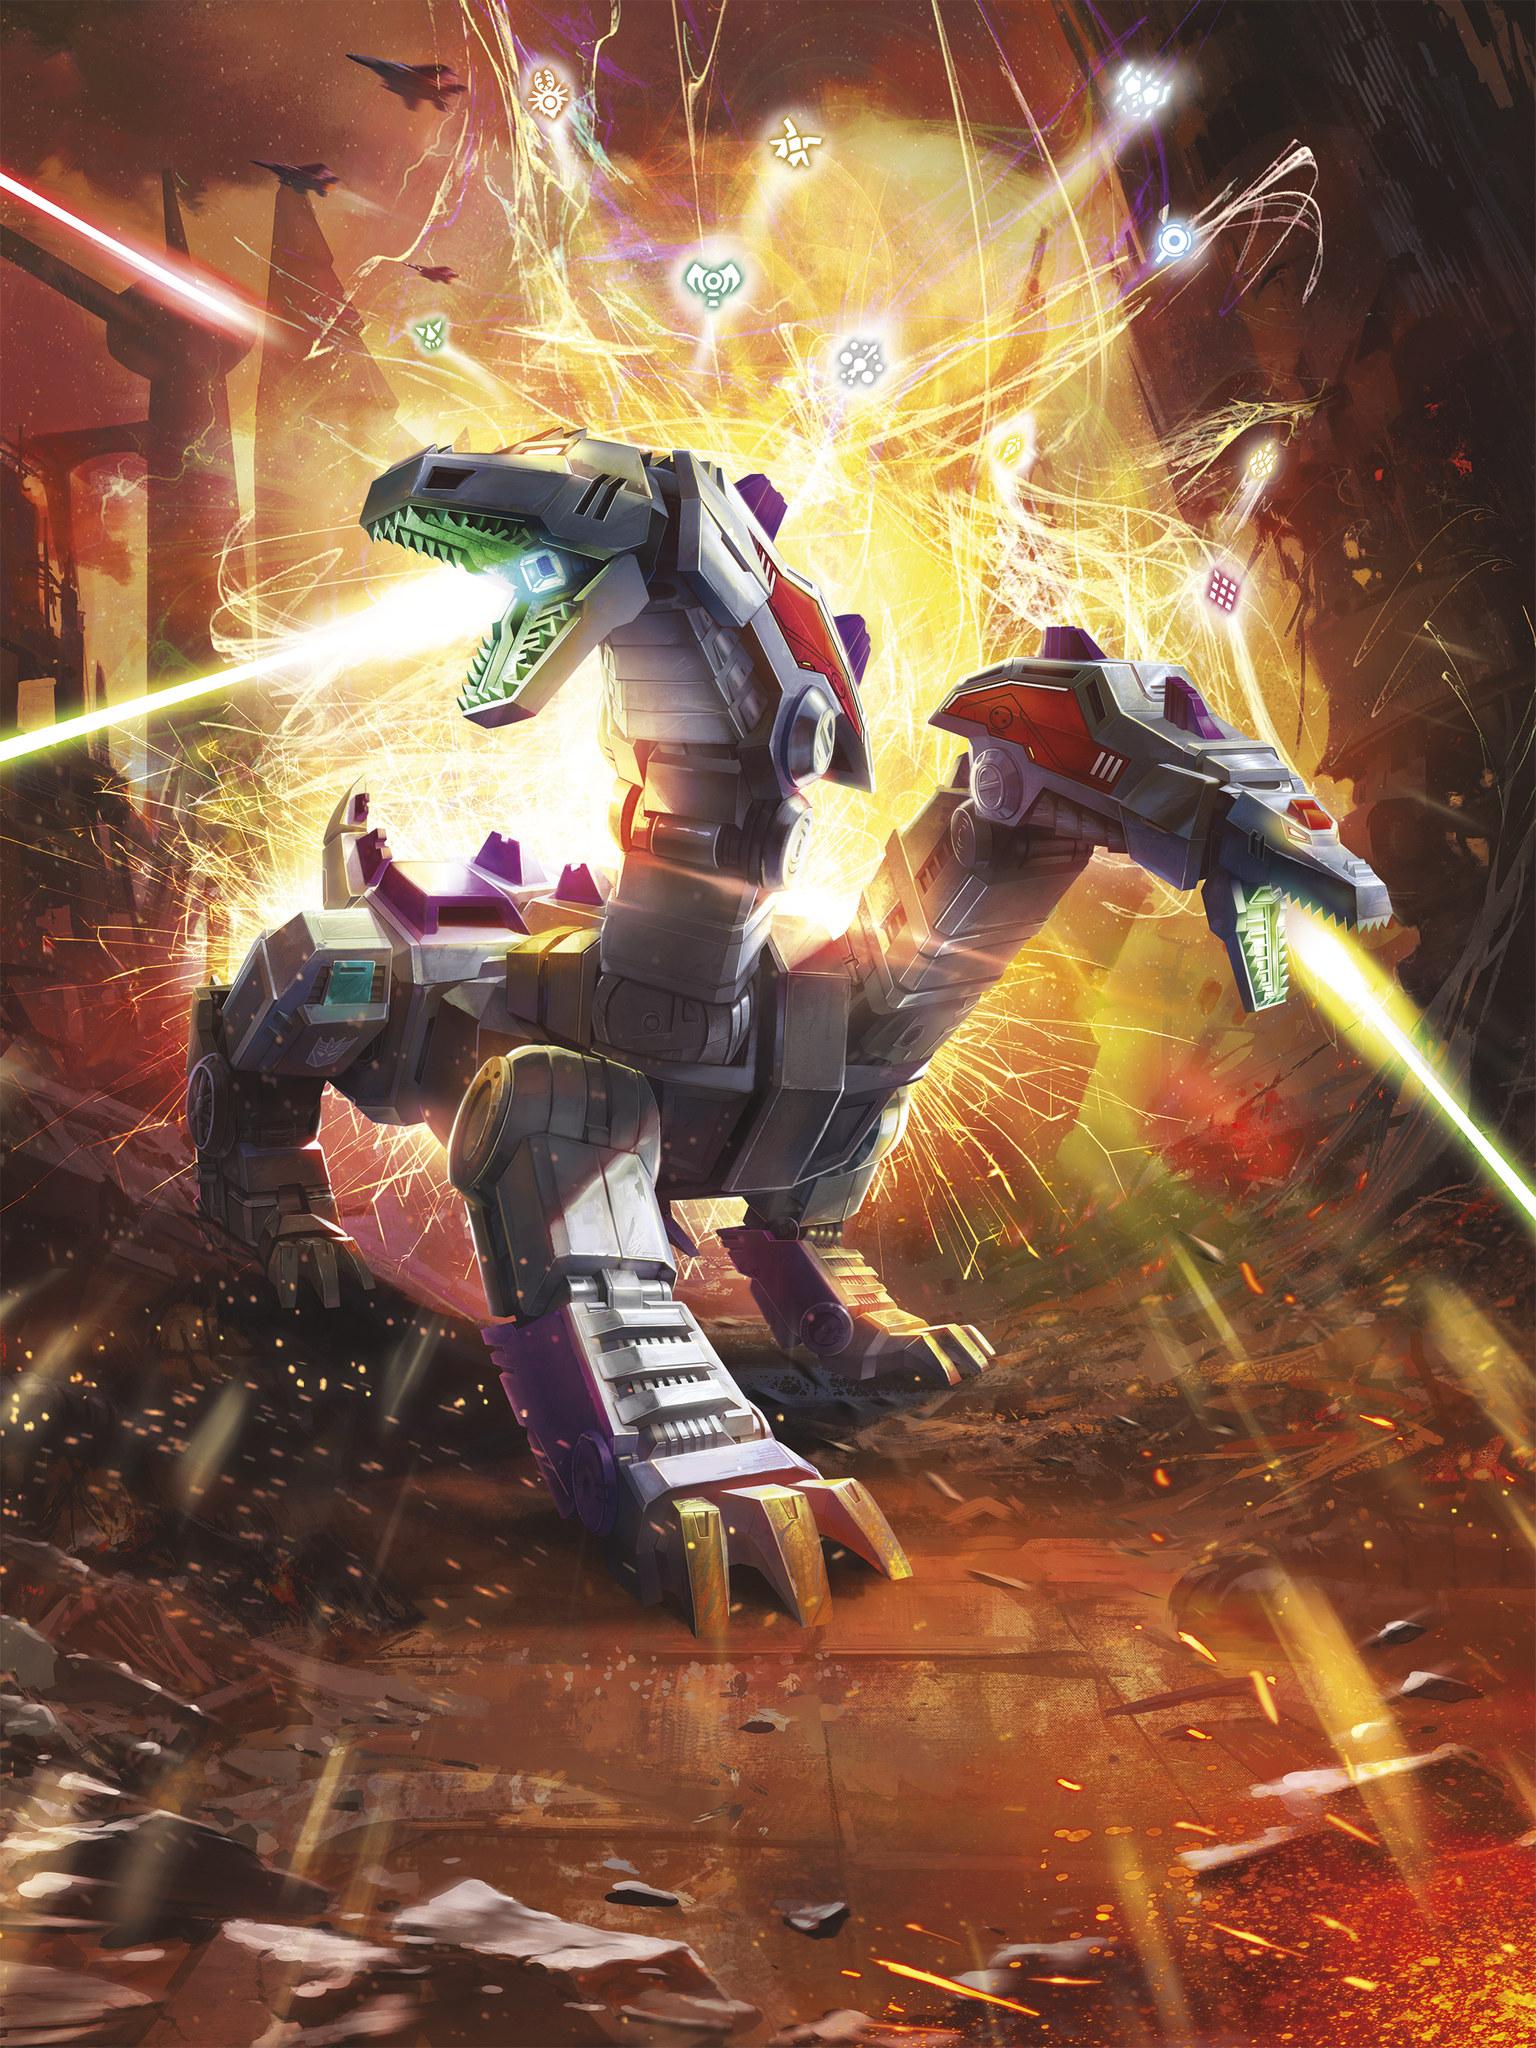 Hun Gurrr Transformers Toys Tfw2005